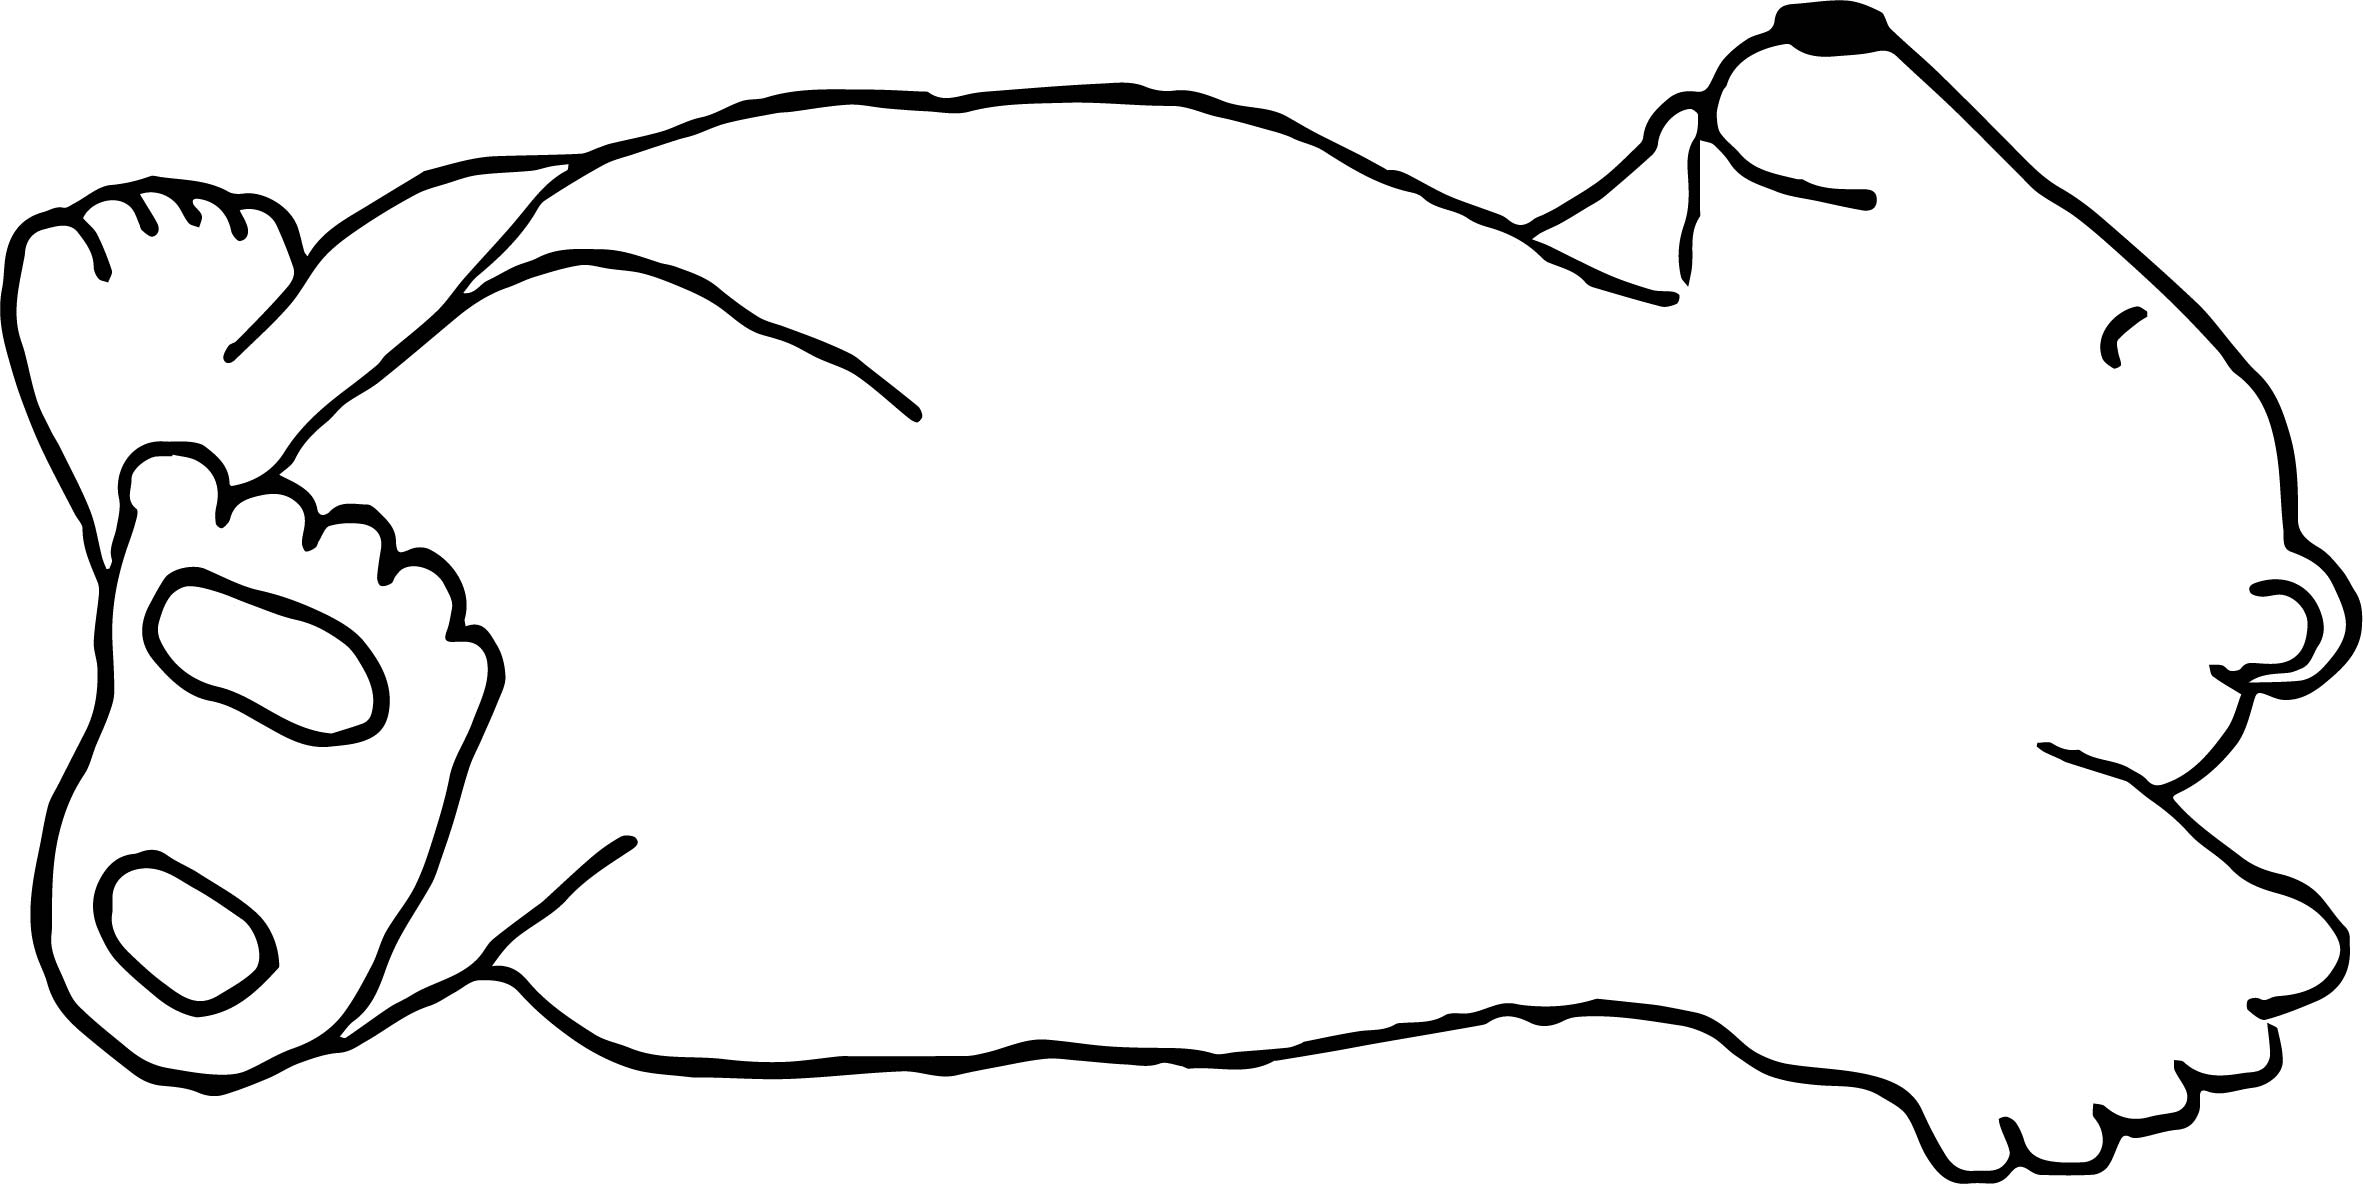 Light Bear Sleeping Coloring Page | Wecoloringpage.com